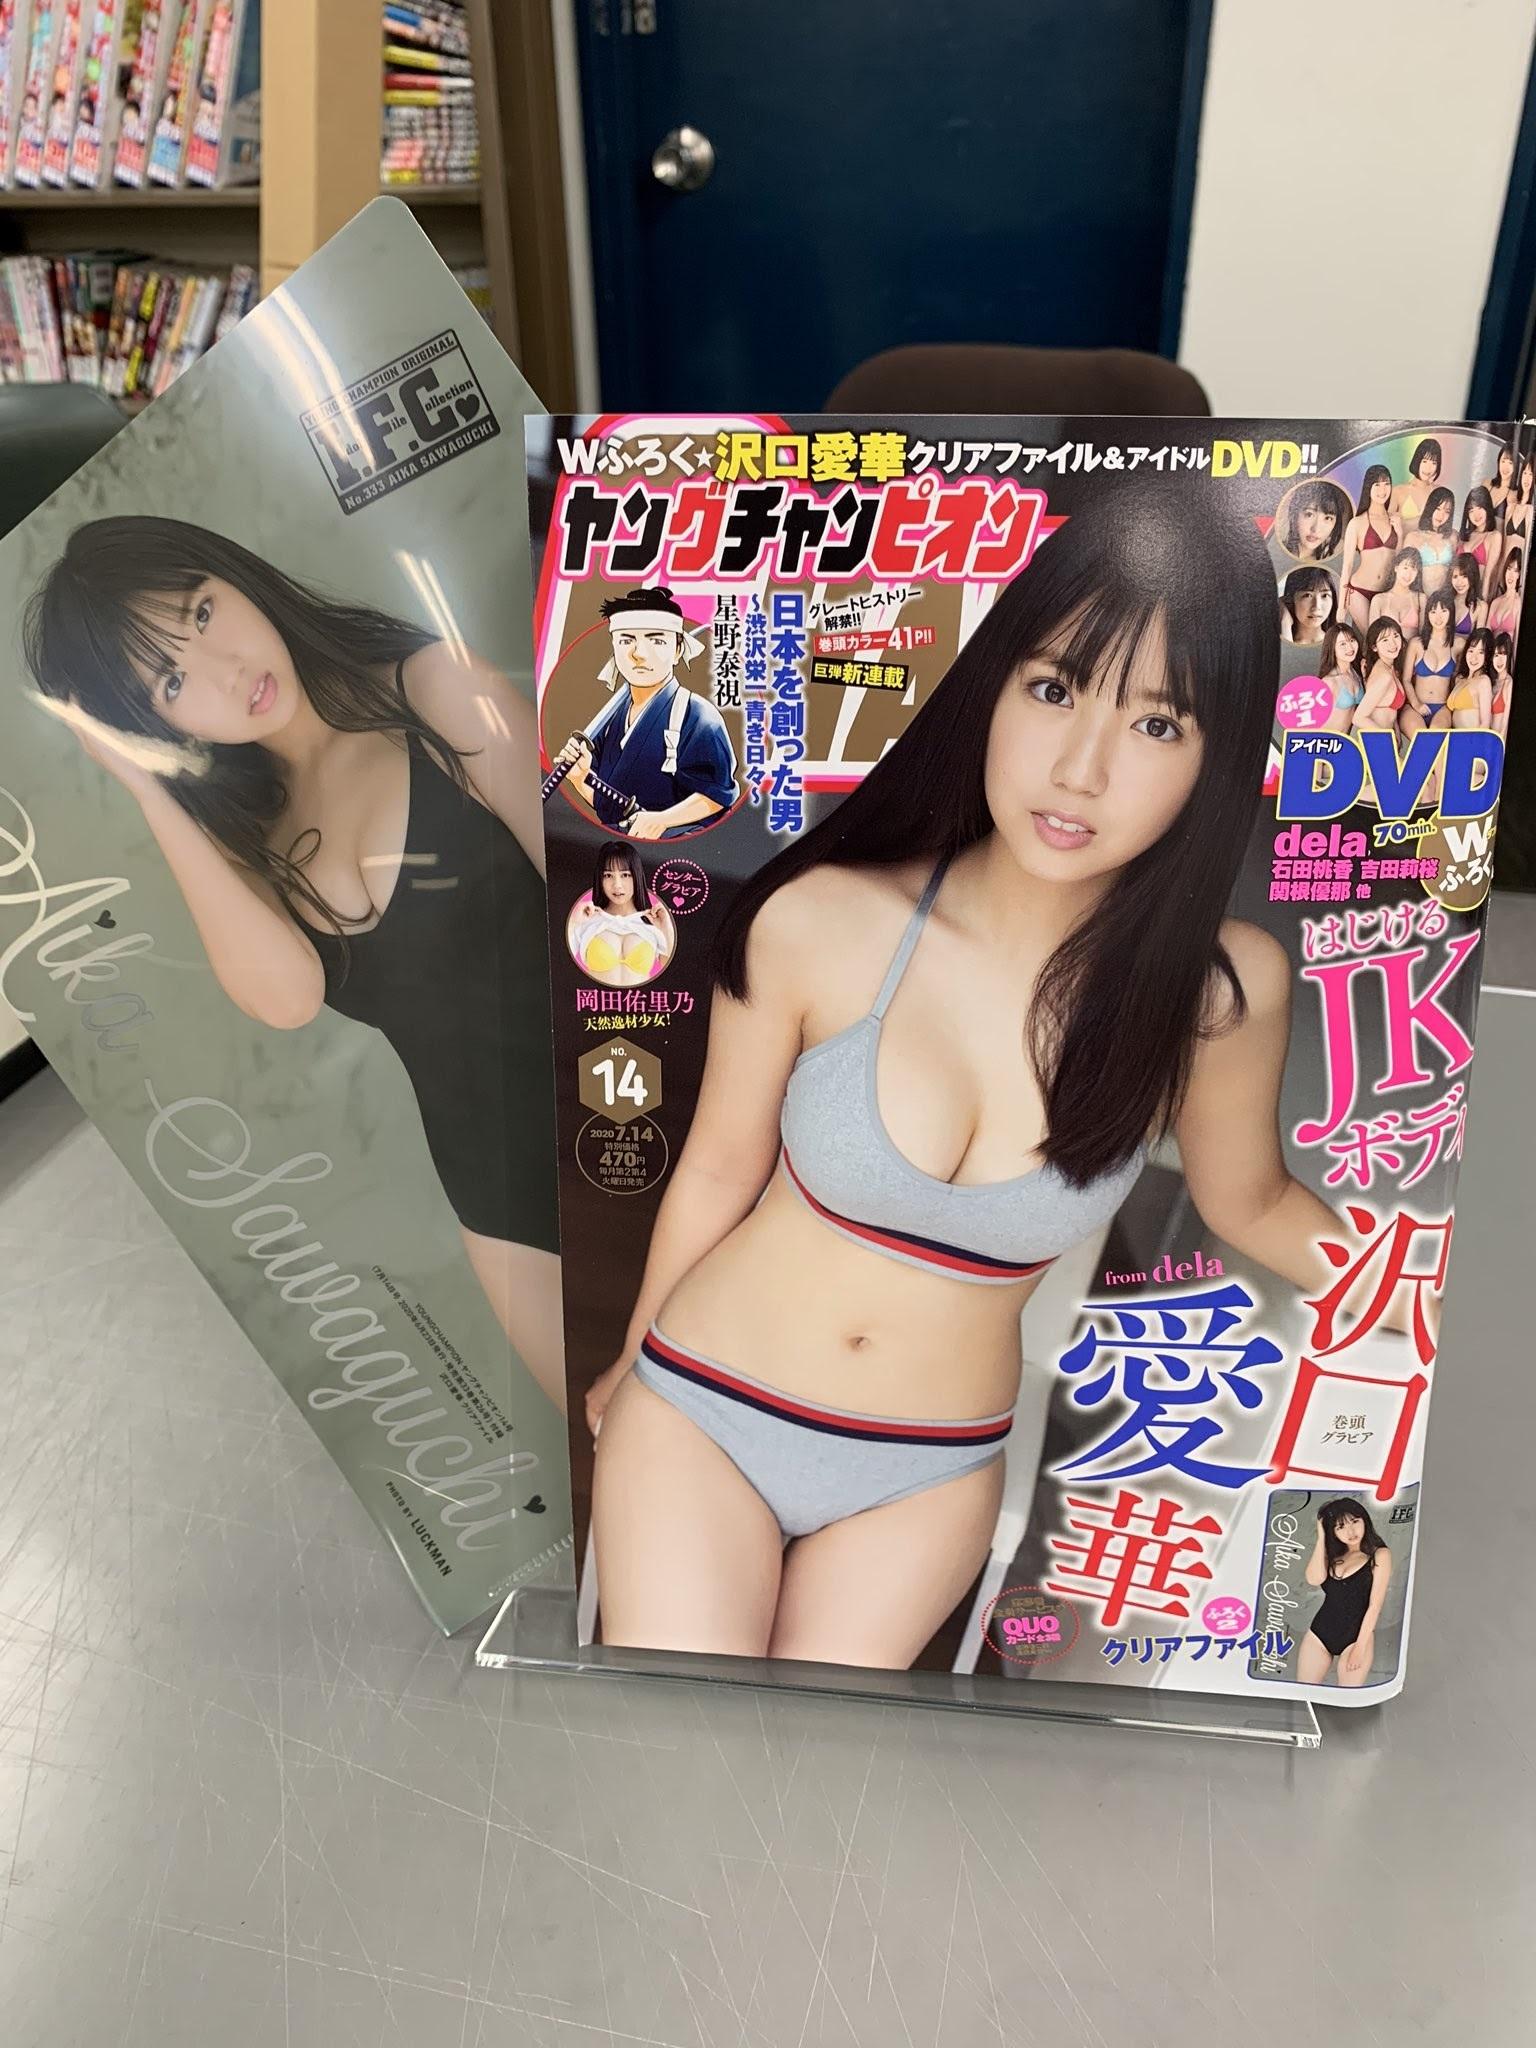 The miracle of popping JK body 17yearold Aika Sawaguchi Swimsuit Gravure 2020007